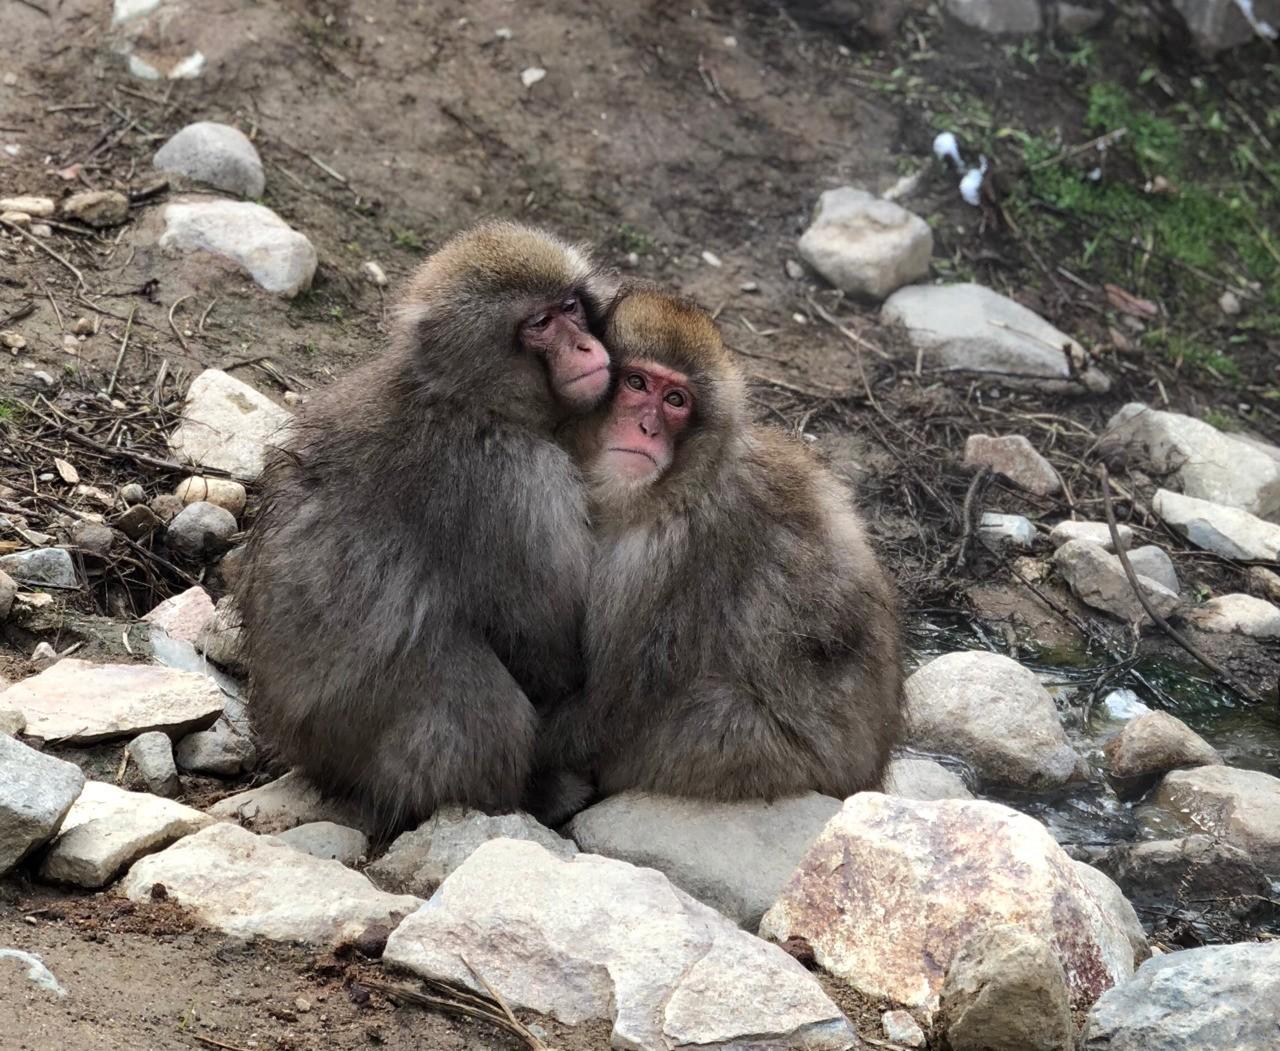 Snow monkeys in Nagano iPhone X No filter